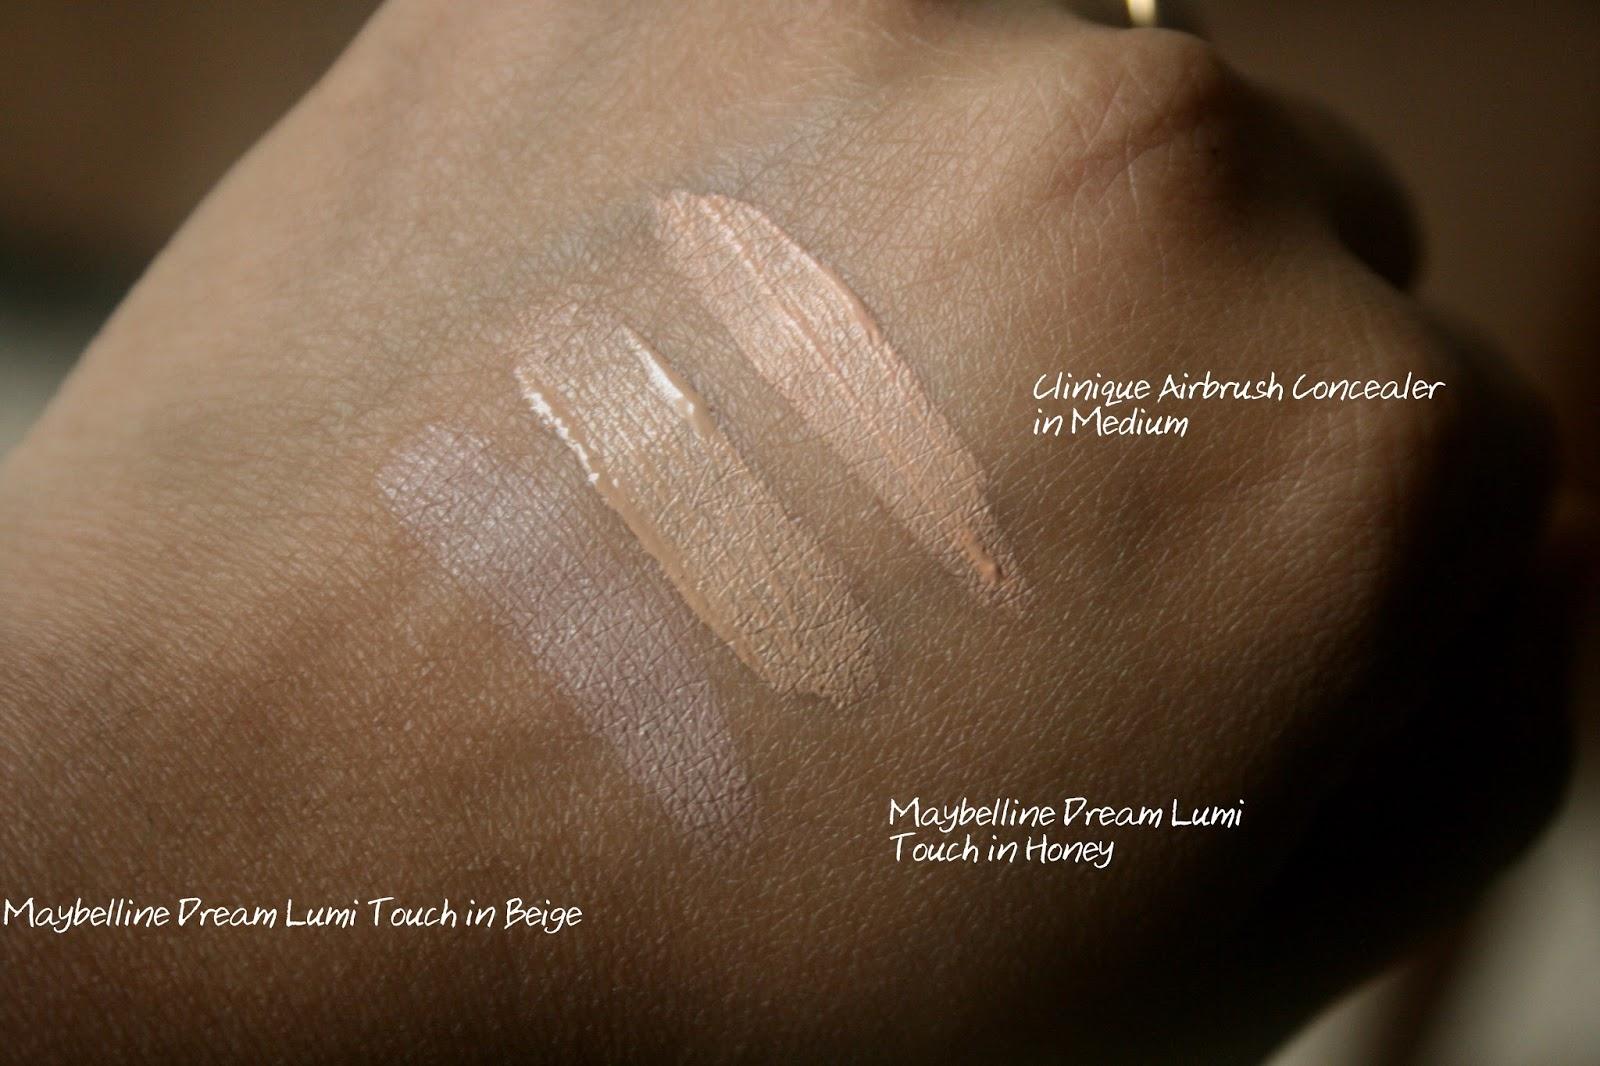 Sephora airbrush makeup